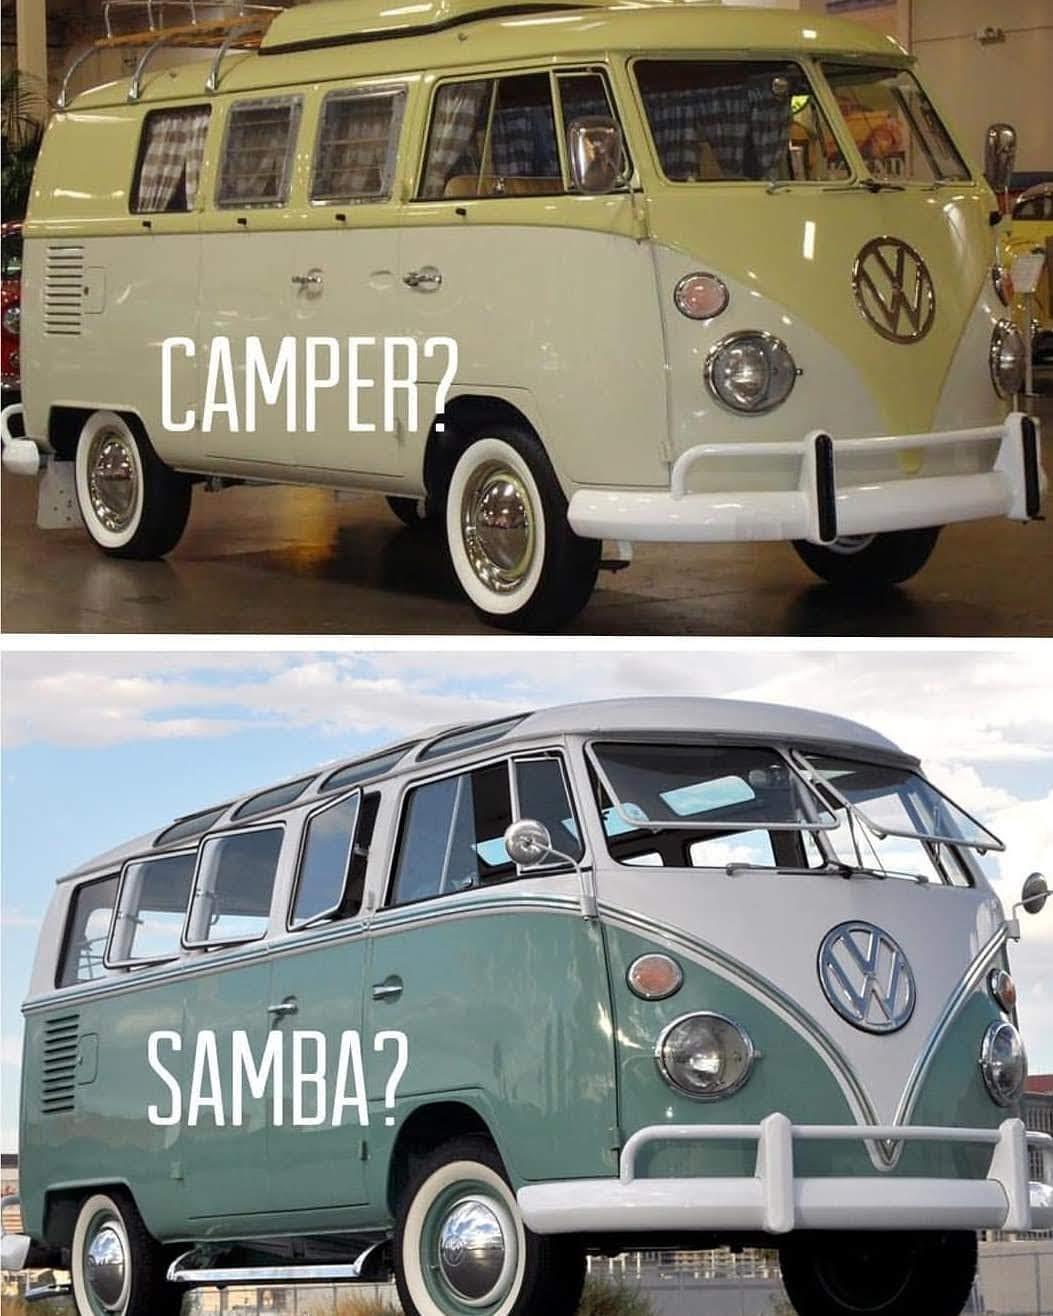 Van Life: Choosing the Right Vehicle - ProjectVanLife